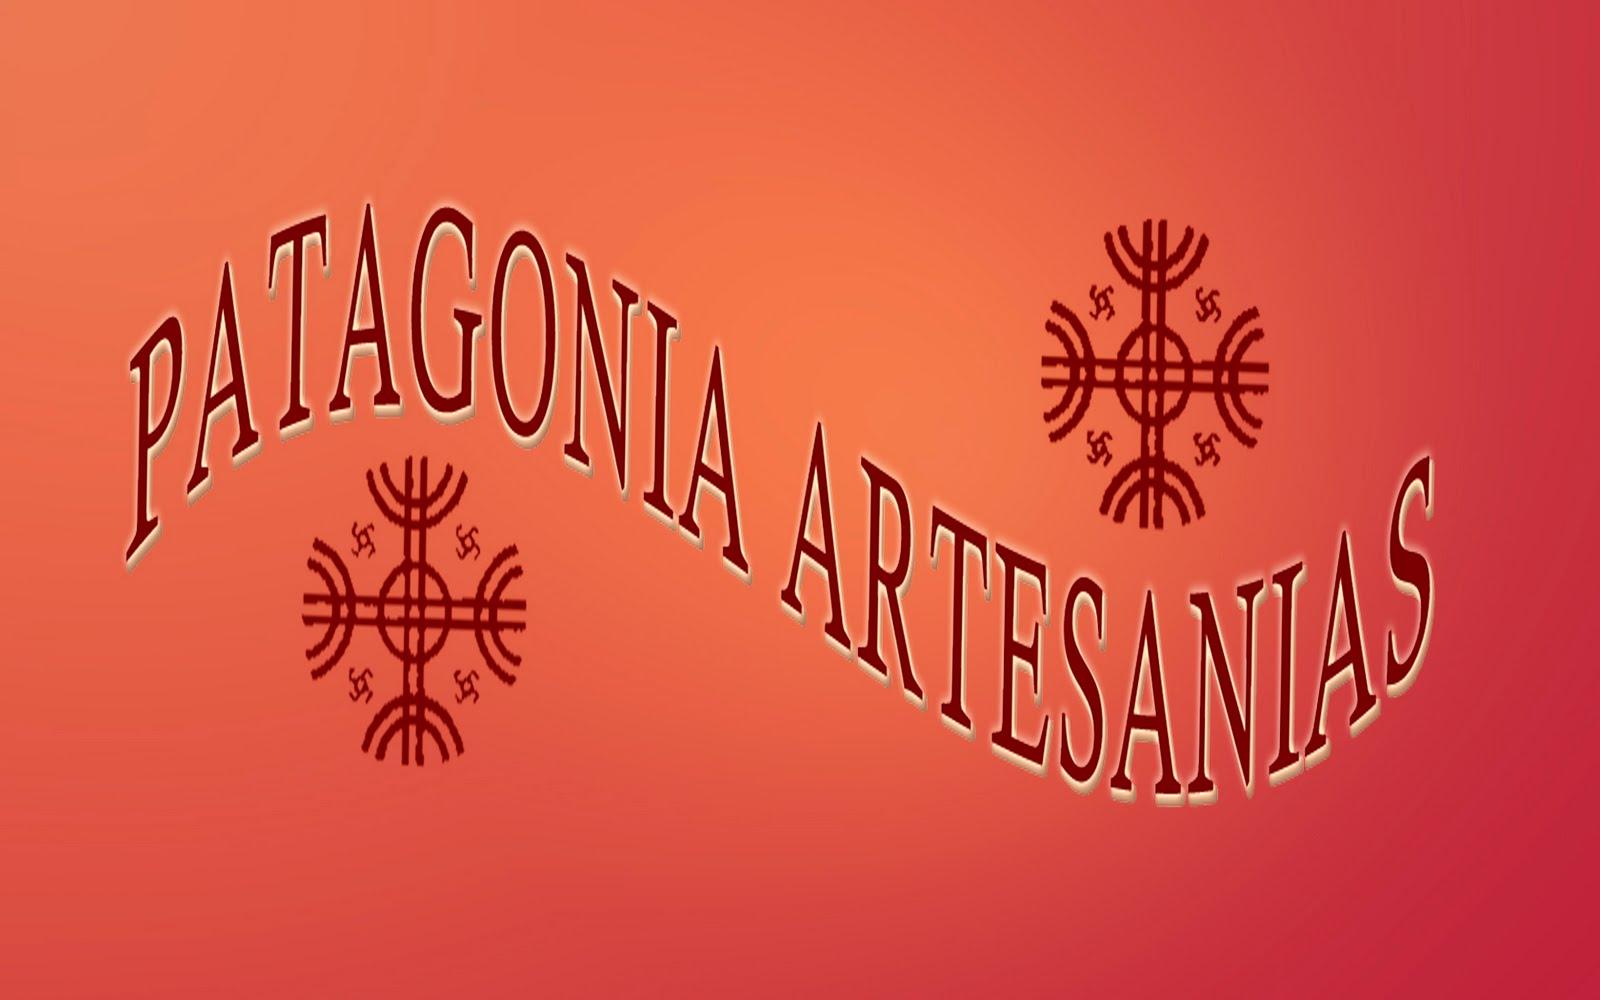 TE INVITO A VISITAR MI OTRO BLOG: PATAGONIA ARTESANIAS